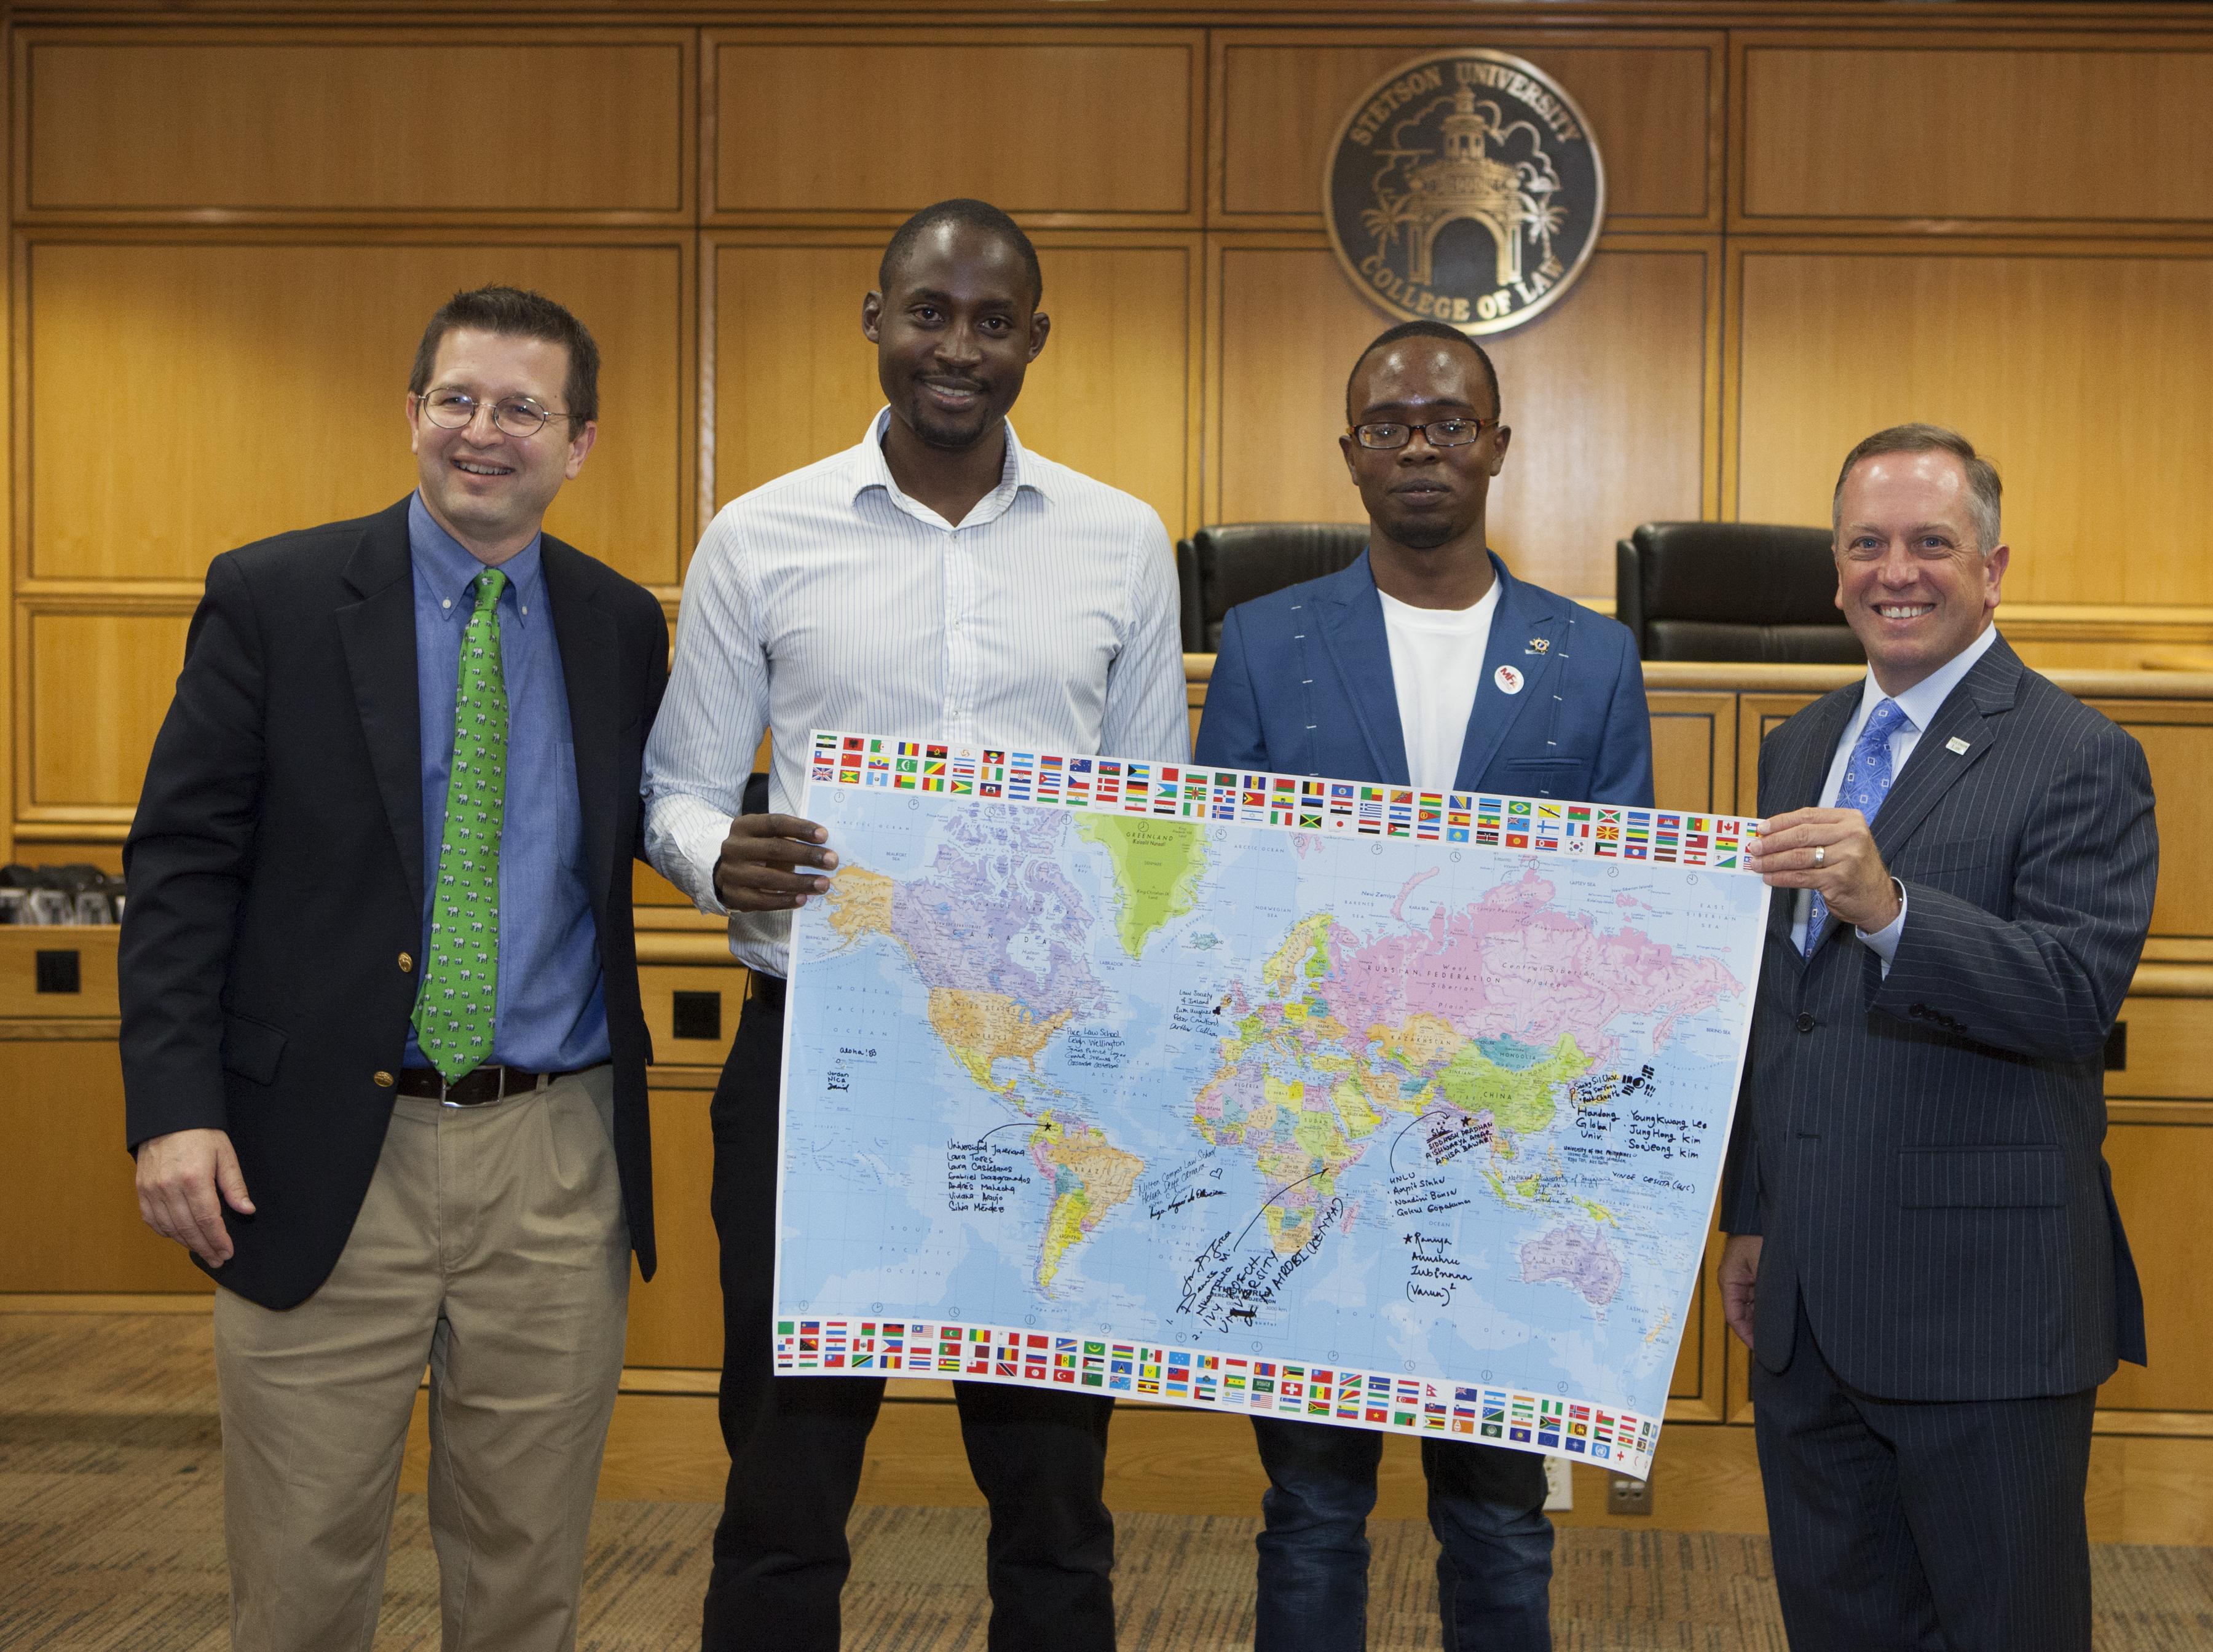 The university of nairobi won the spirit of stetson award